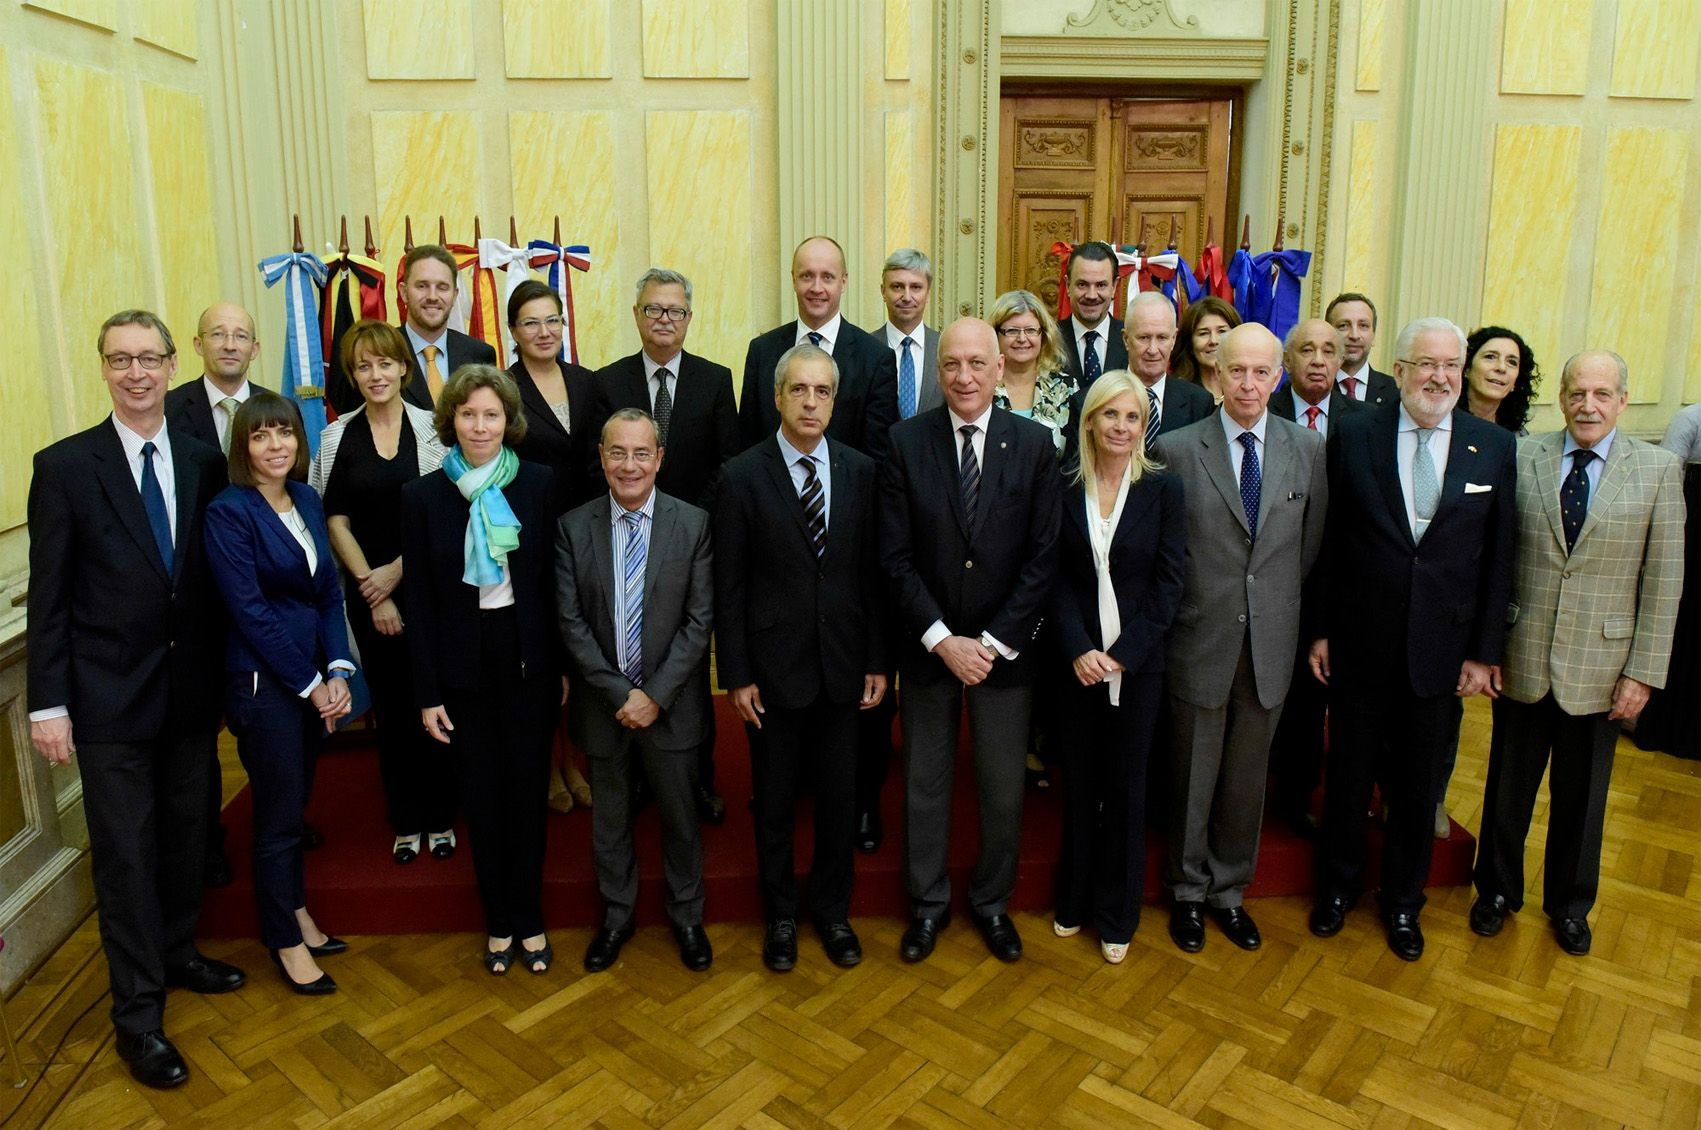 Santa Fe estrecha lazos con la Unión Europea